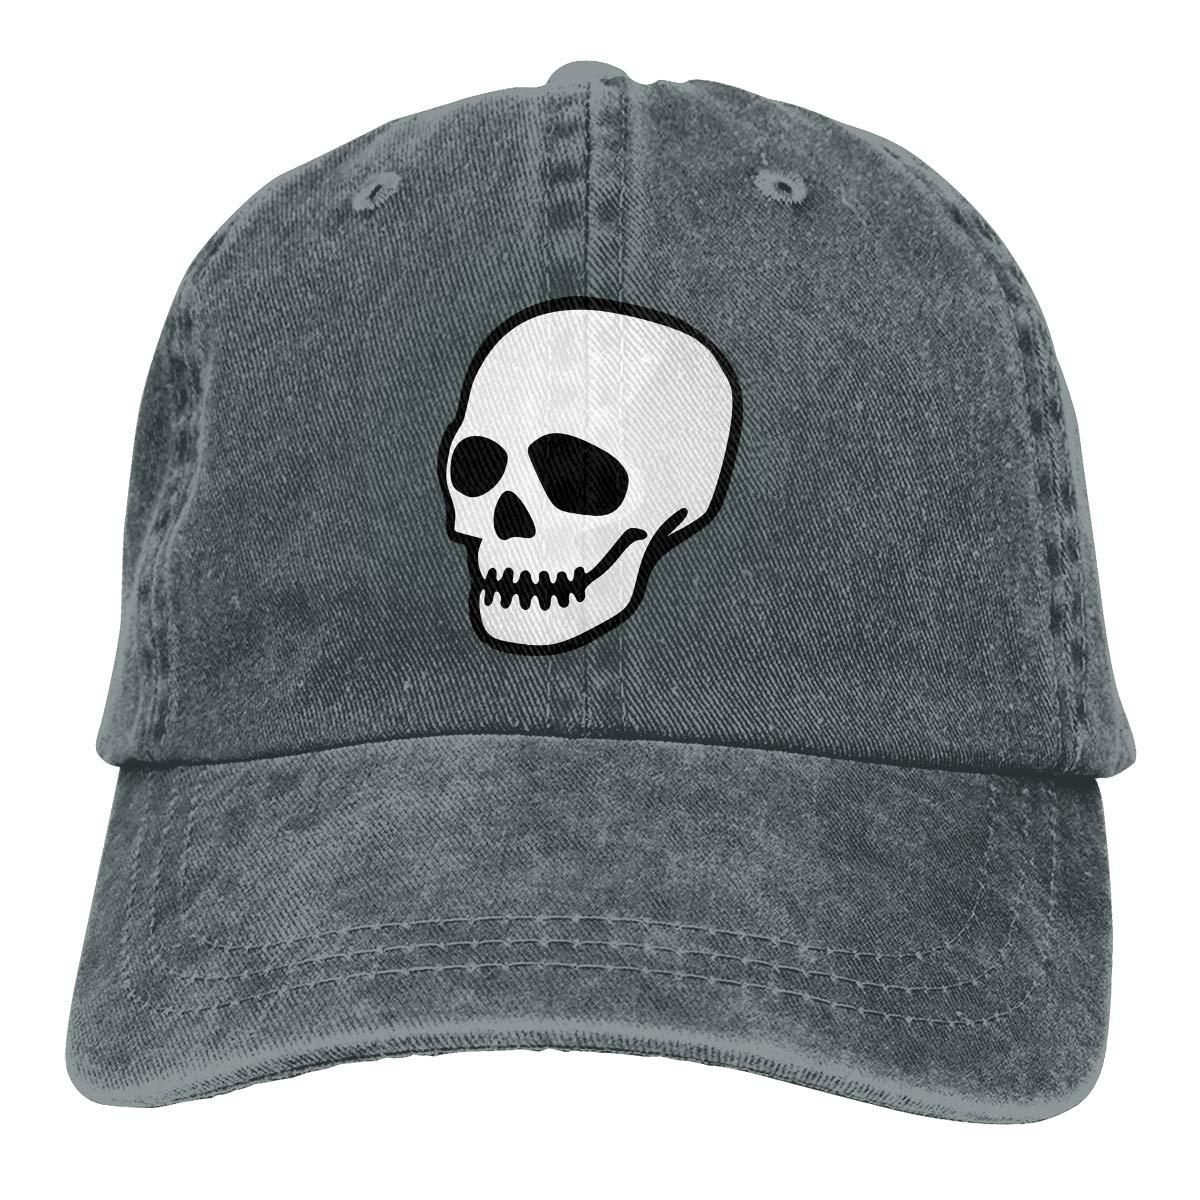 Adult Unisex Cowboy Cap Adjustable Hat Sugar Skull Cotton Denim